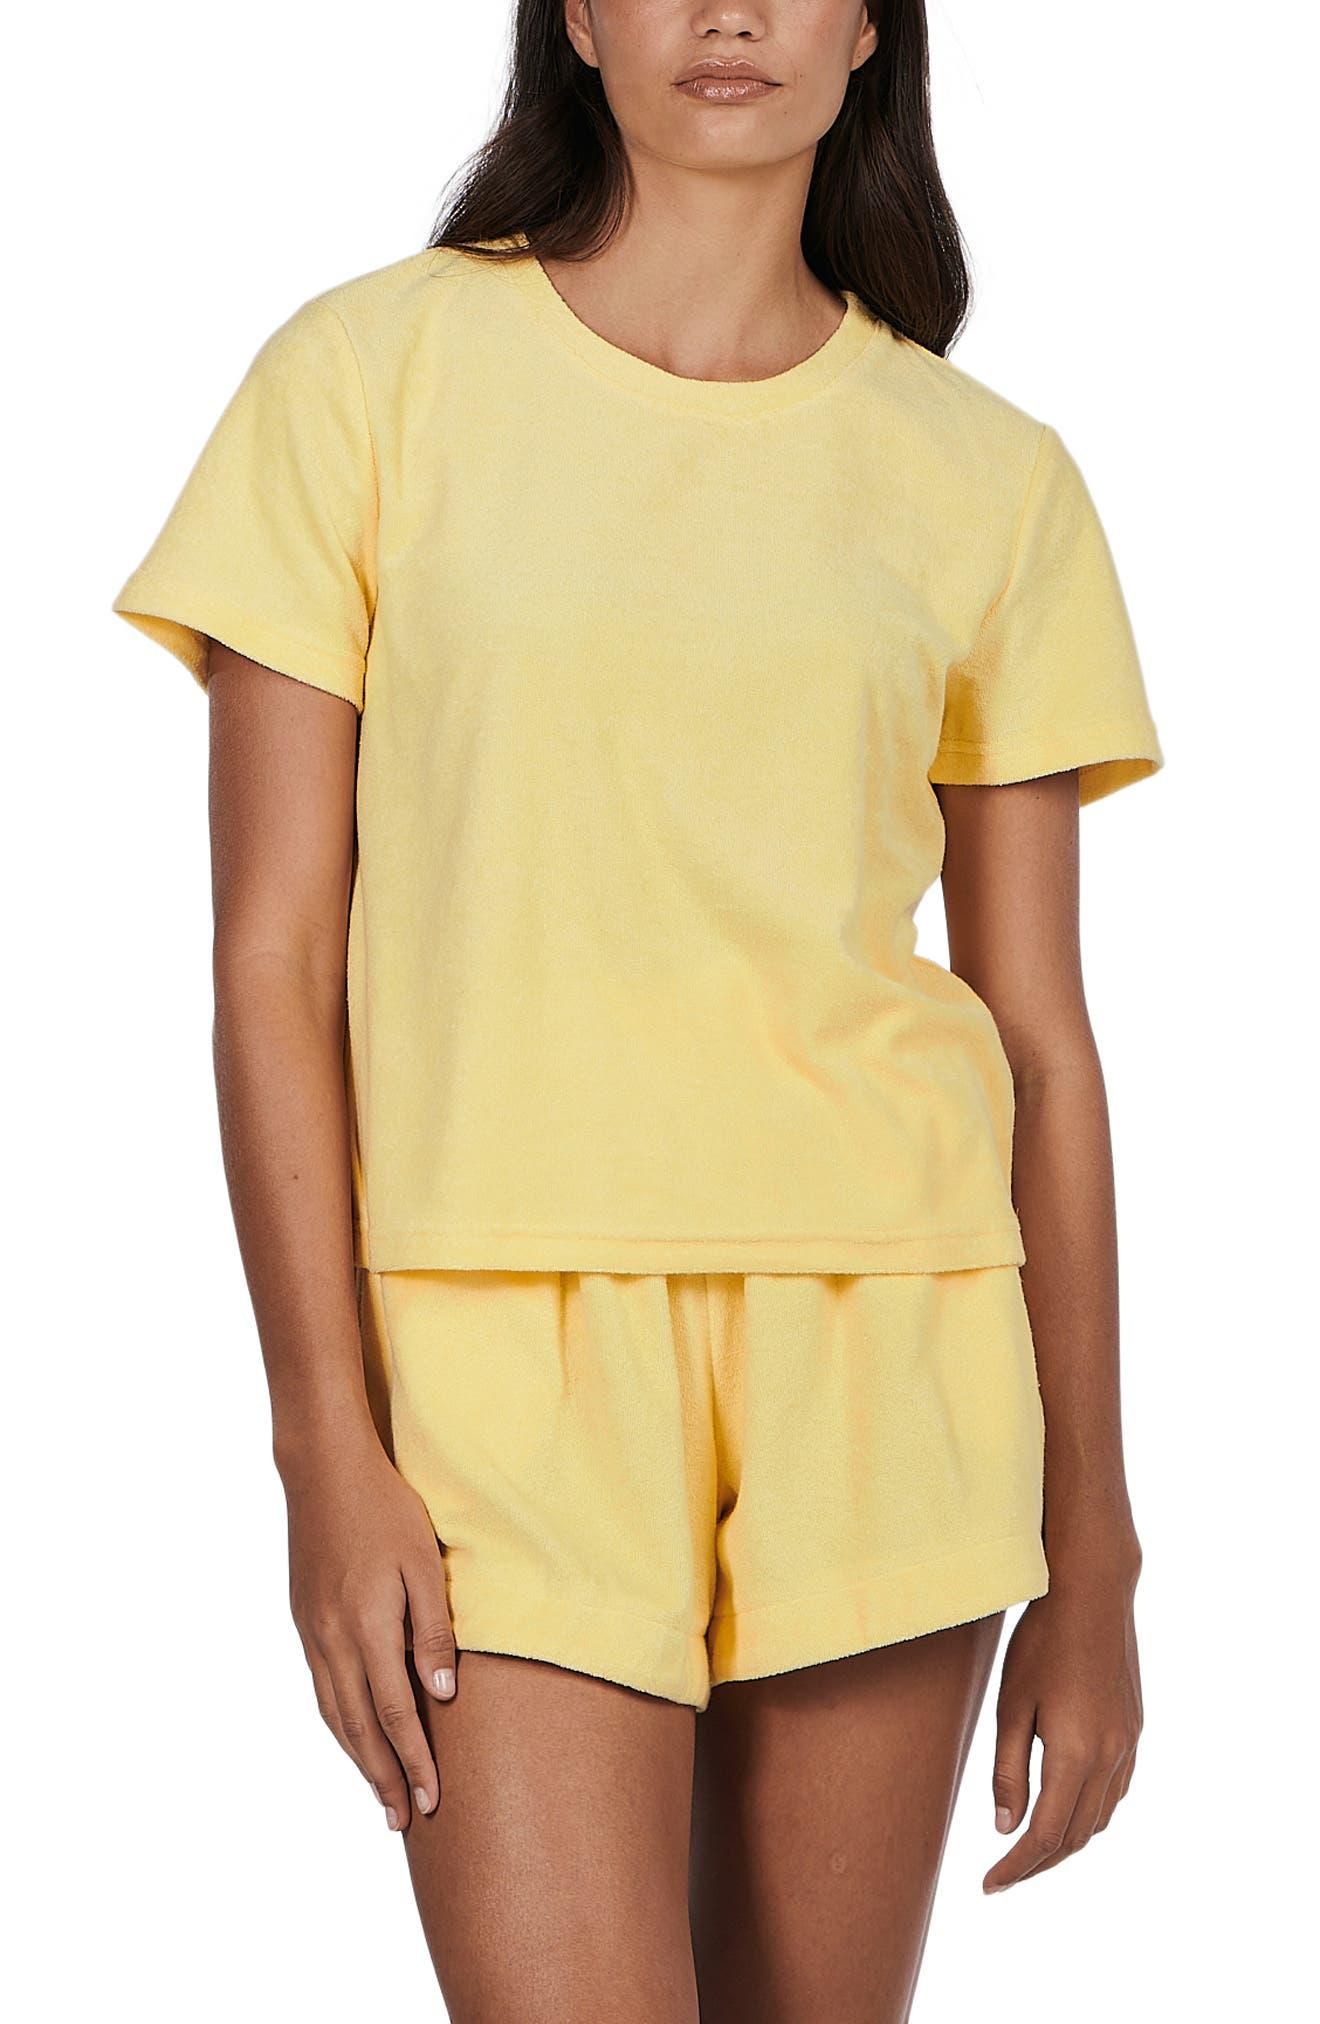 Kaylee Terry T-Shirt